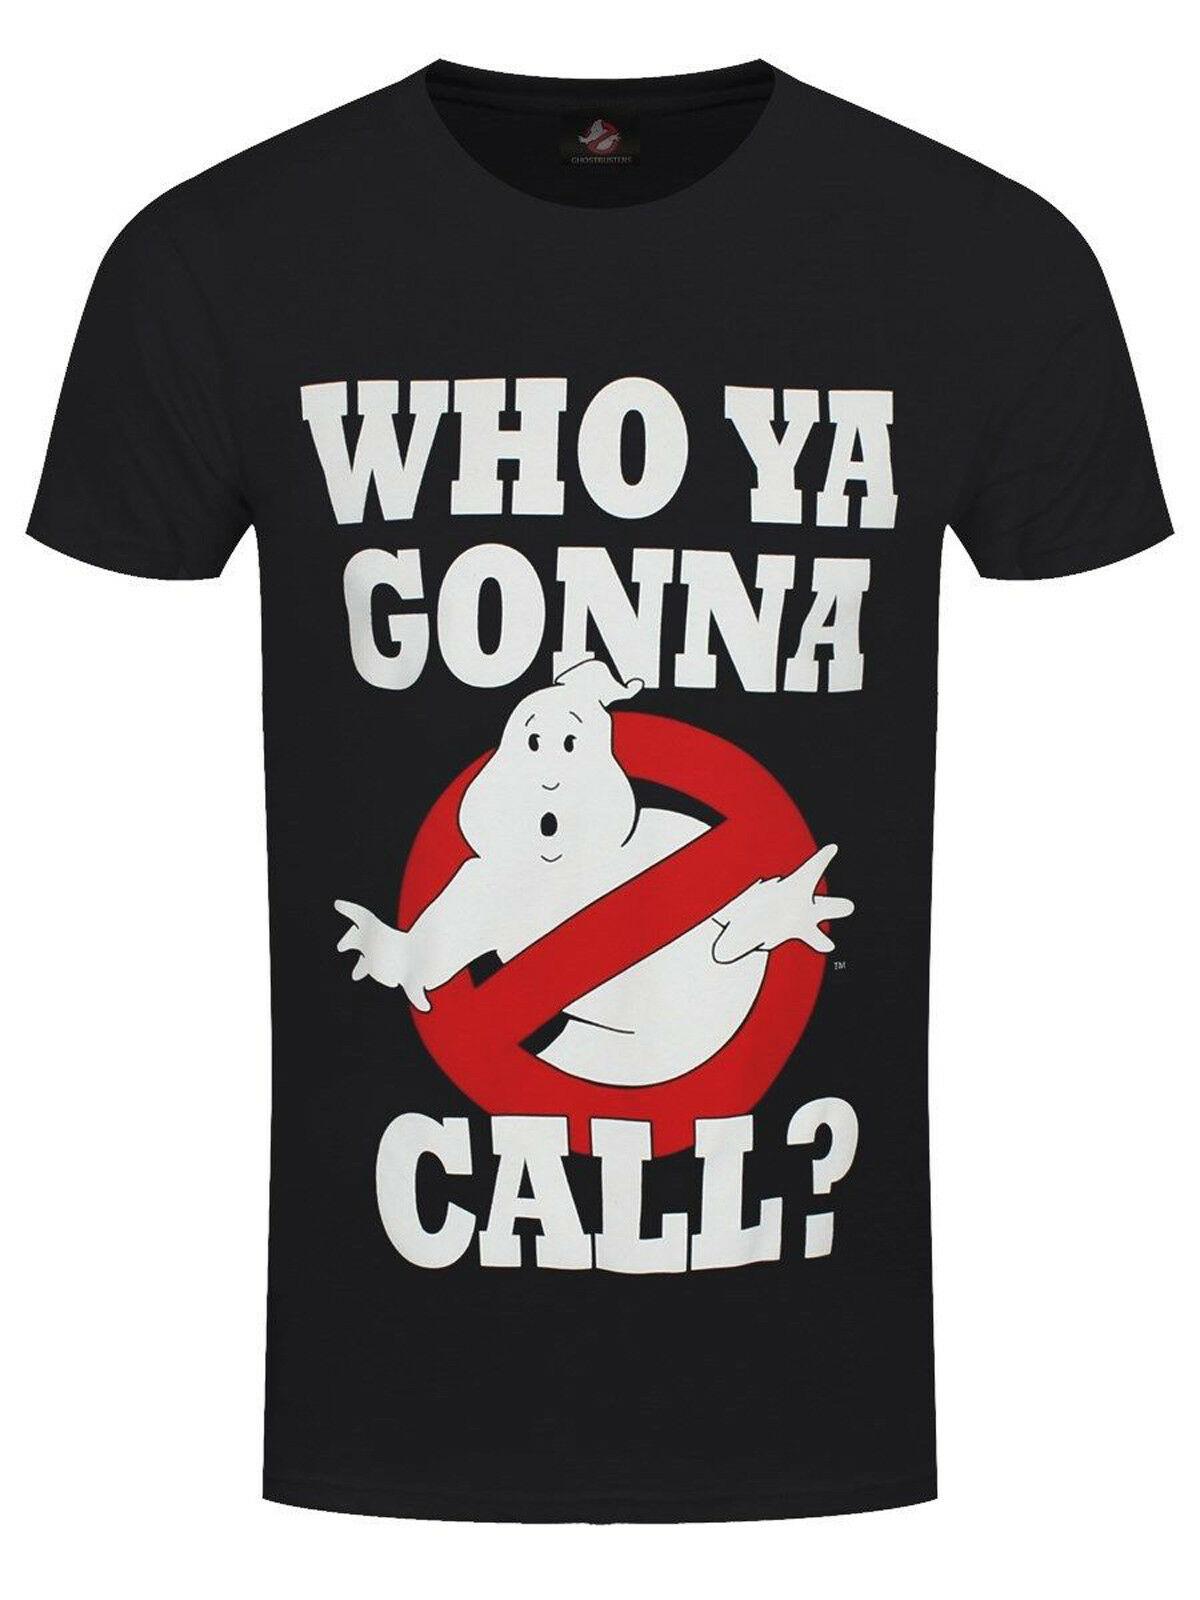 Ghostbusters Bill Murray Dan Aykroyd Official Tee T-Shirt Mens Unisex